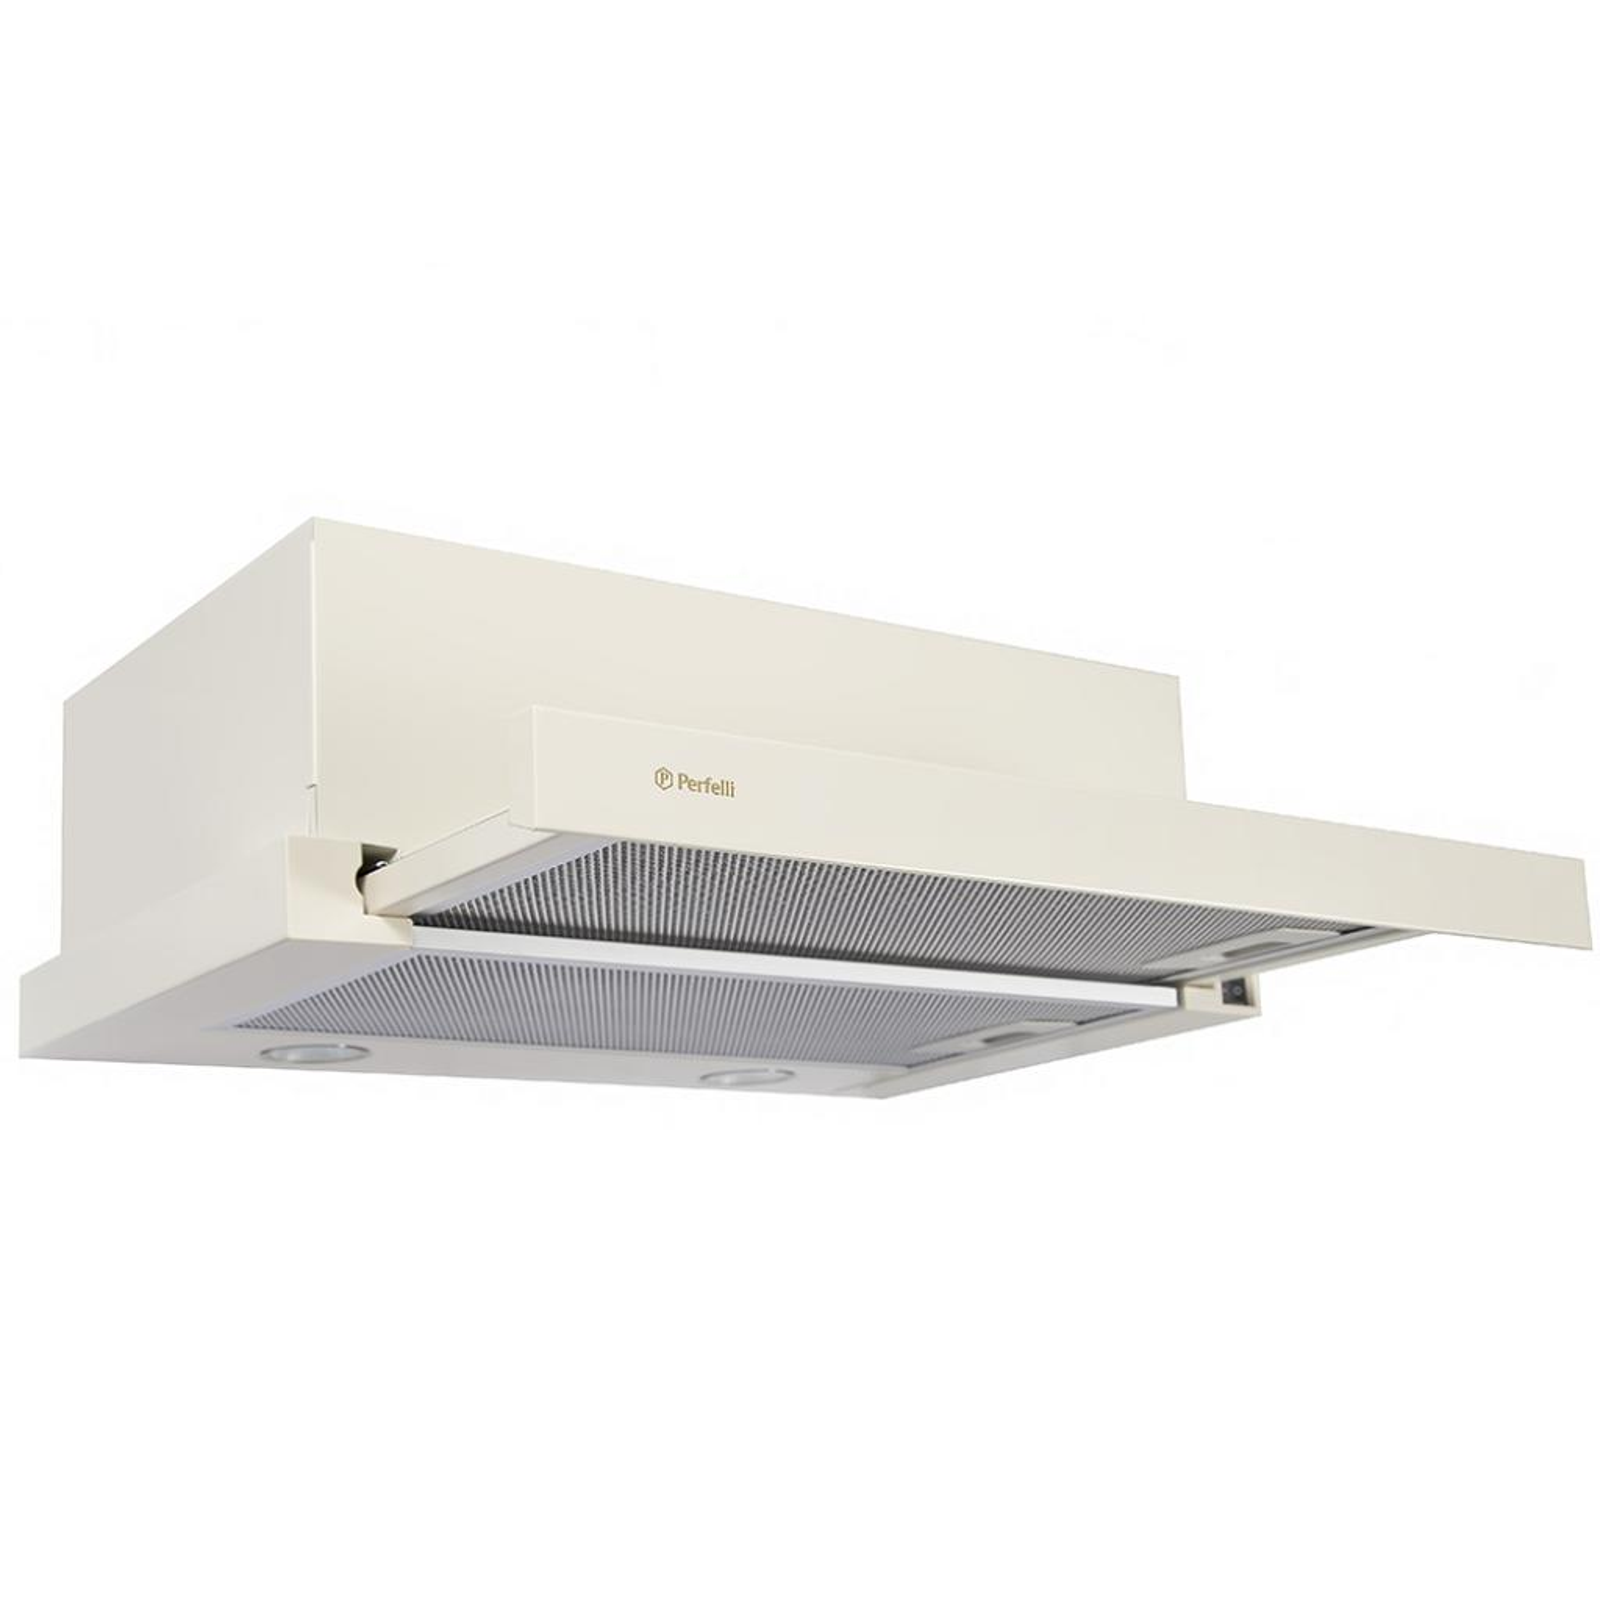 Вытяжка кухонная PERFELLI TL 5103 IV LED